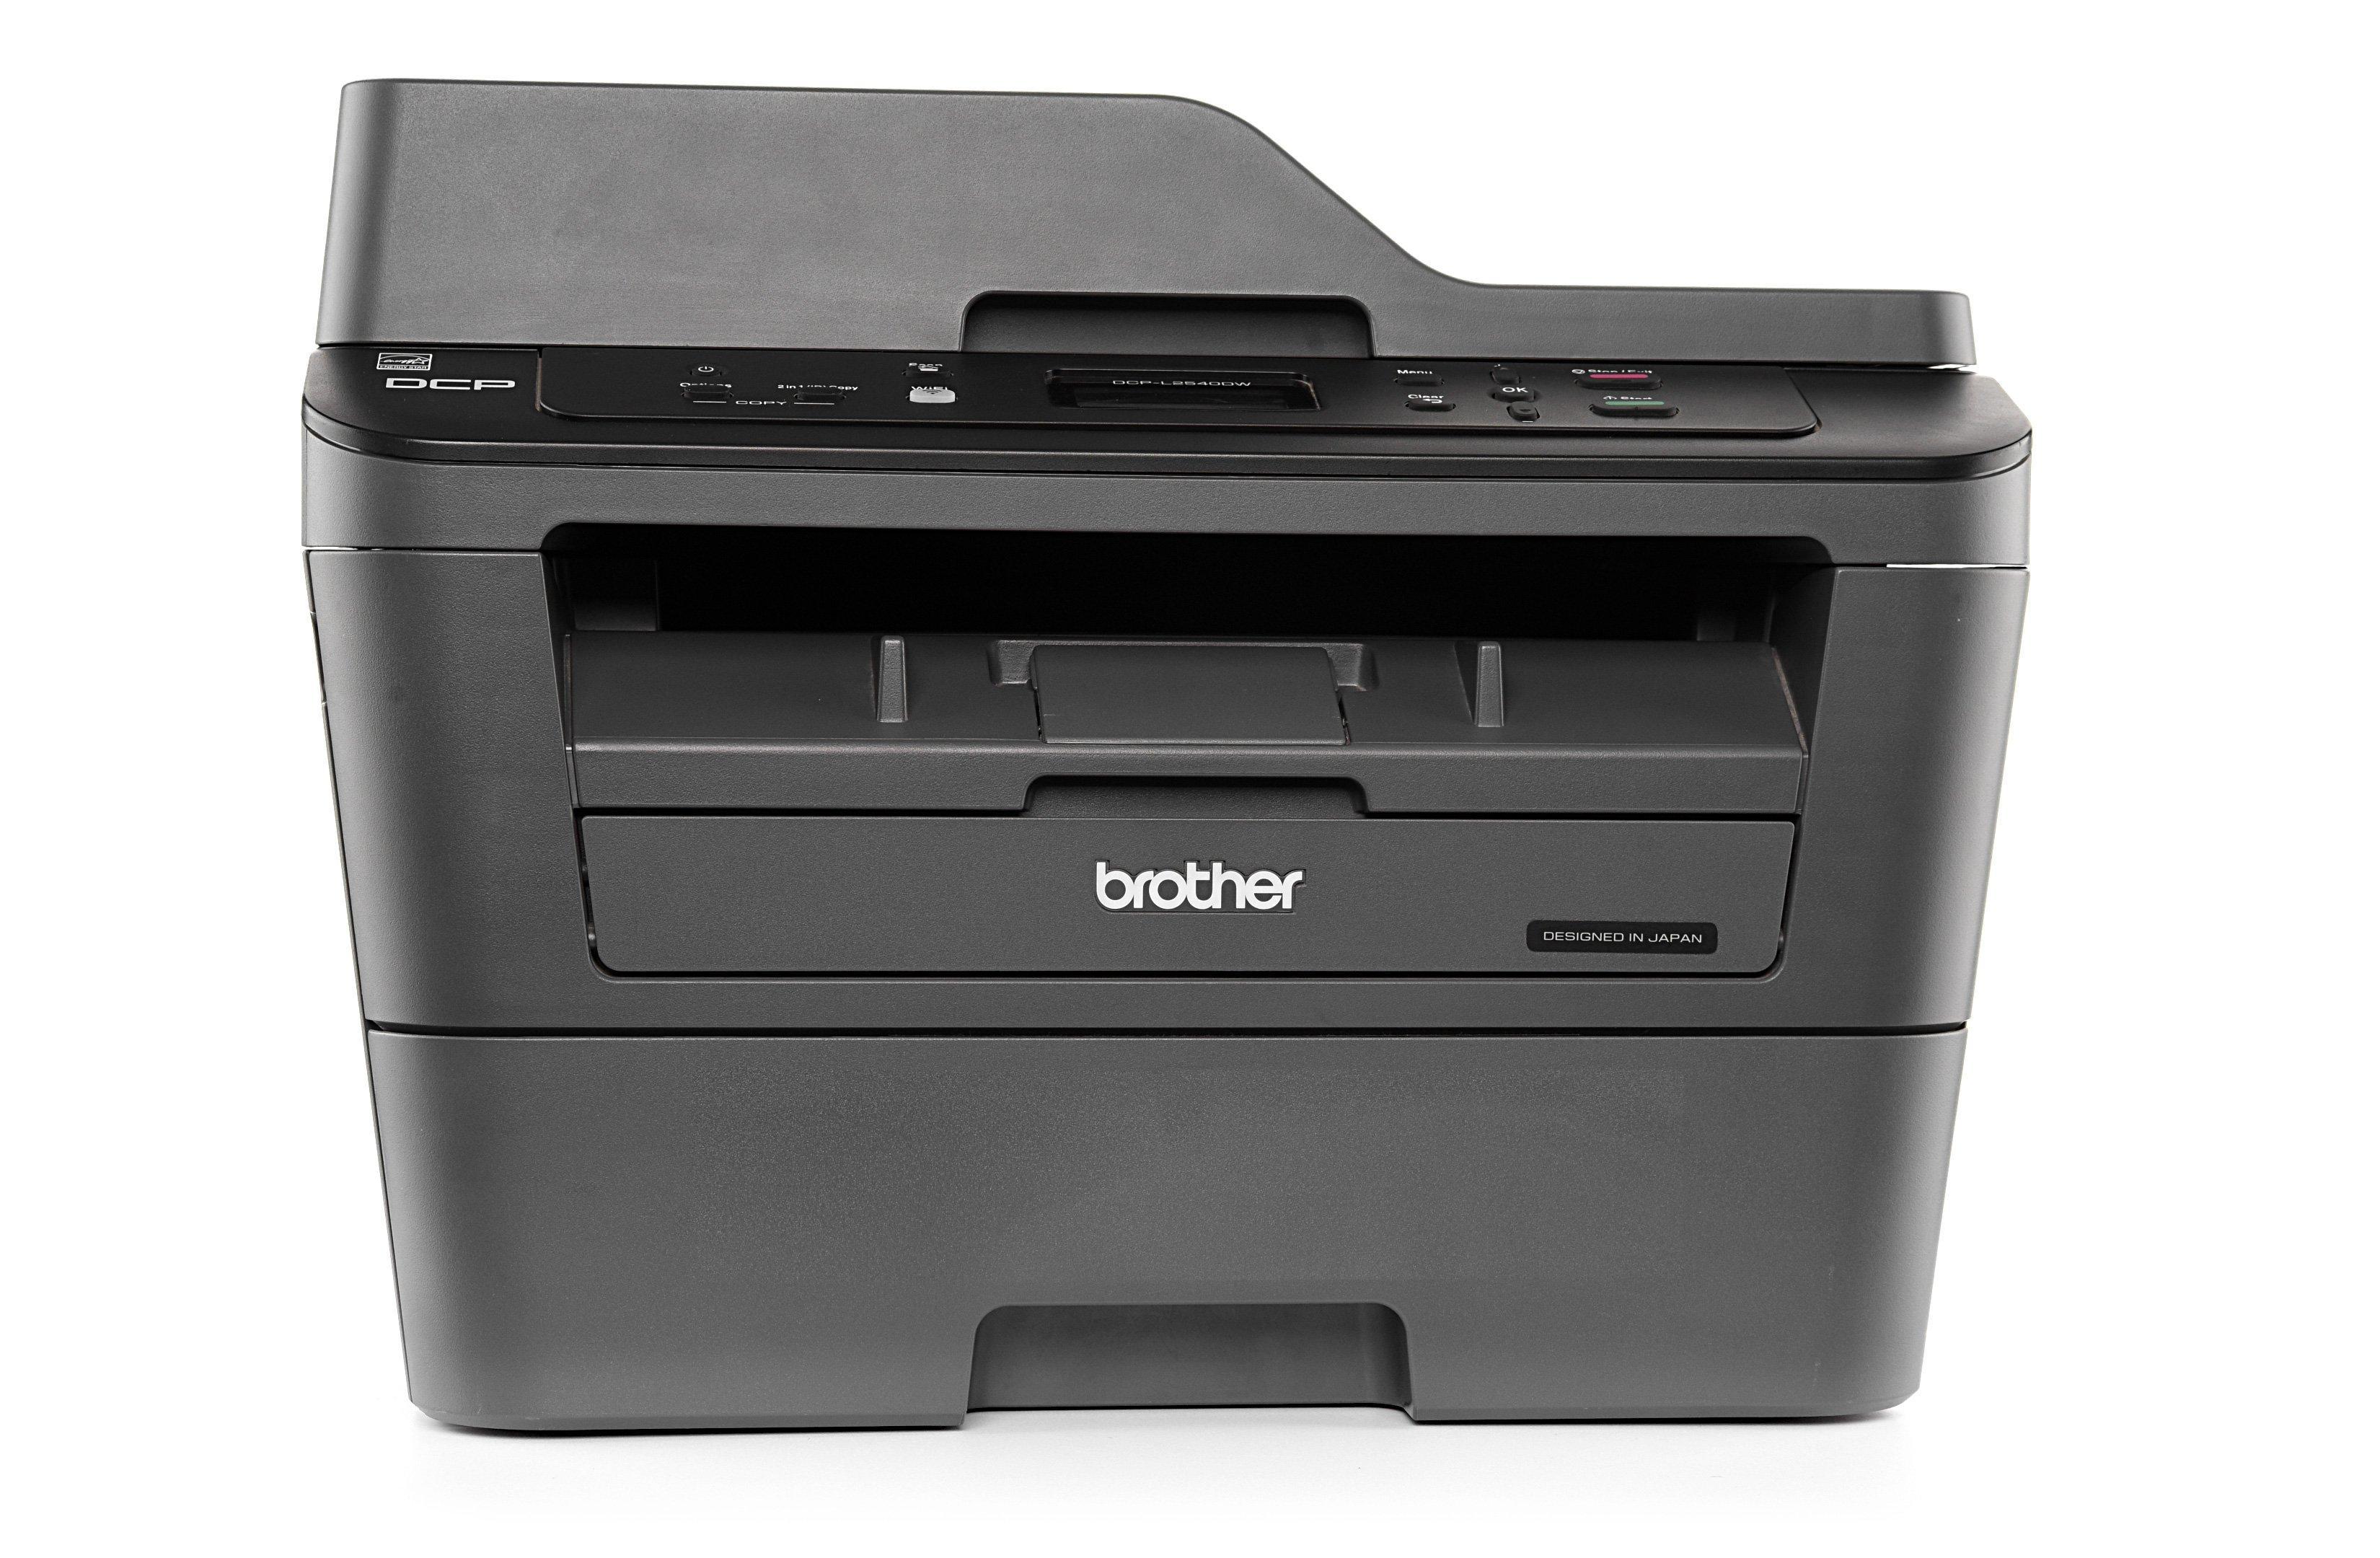 Brother DCP-L2540DW Laser Printer, Black/White - eXtra Saudi